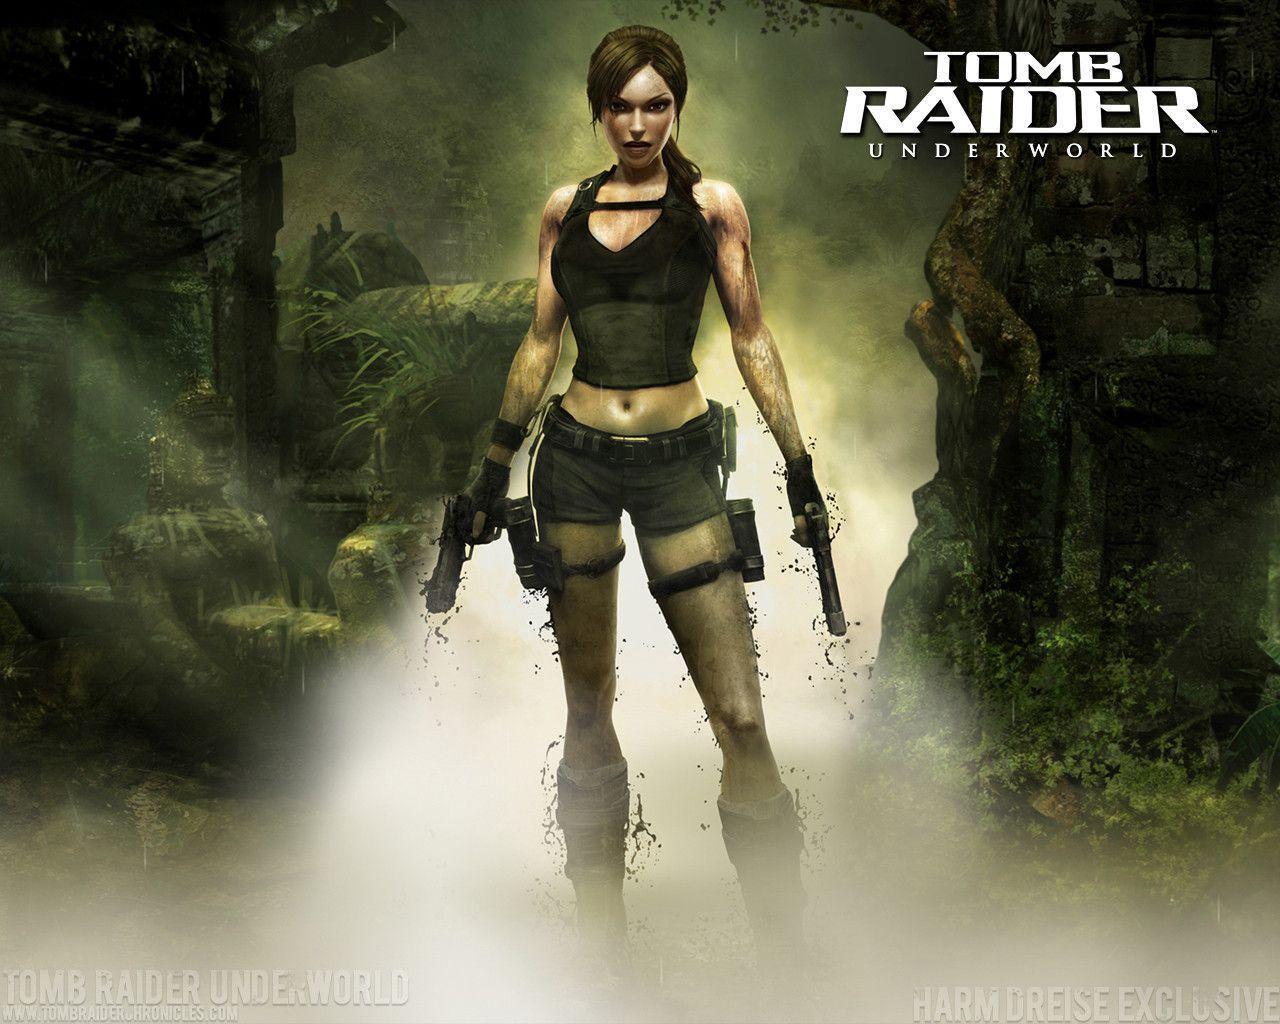 Lara Croft Tomb Raider Wallpapers Wallpaper Cave